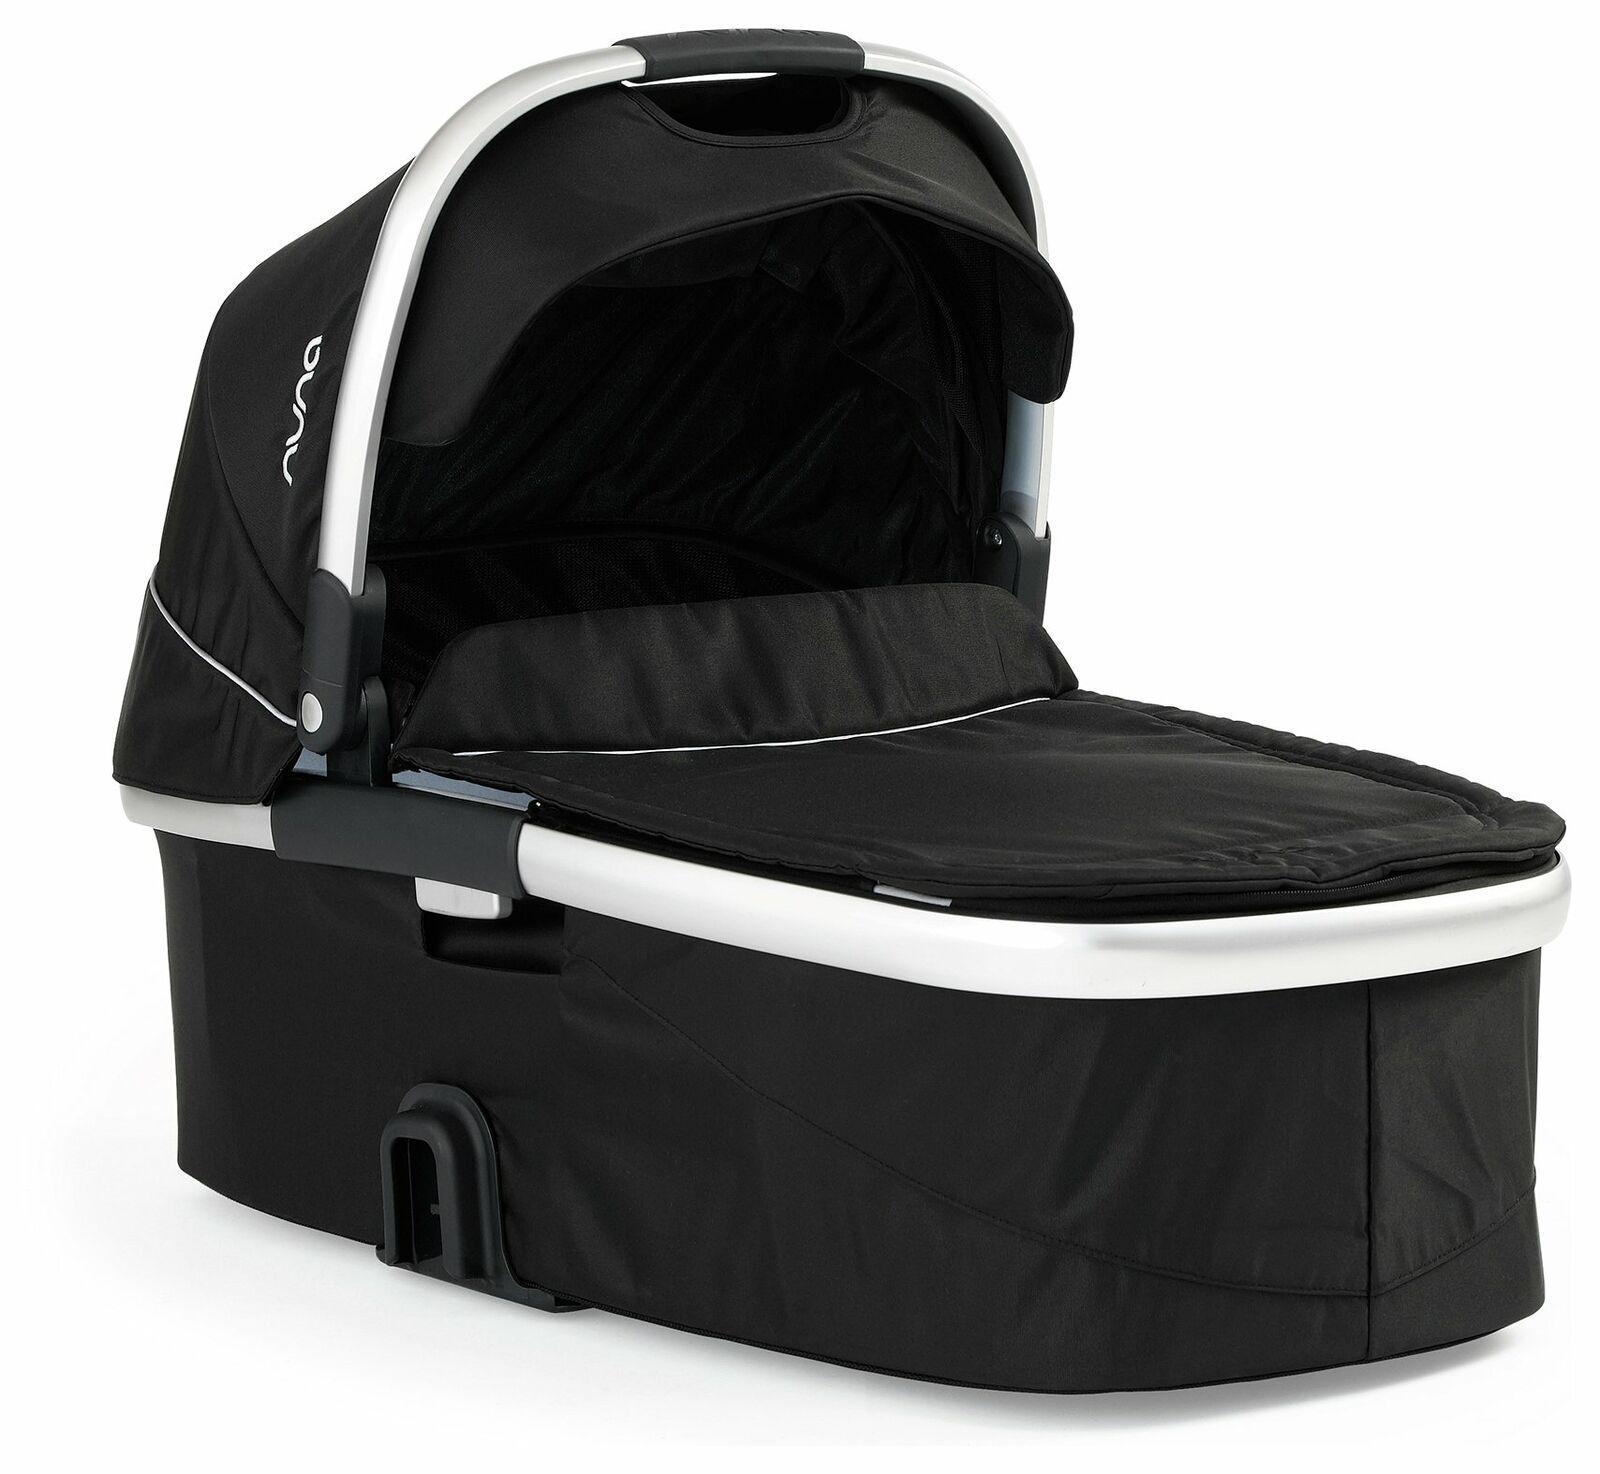 Nuna Ivvi Carry Cot - Caviar £19.99 delivered from Ebay/Argos